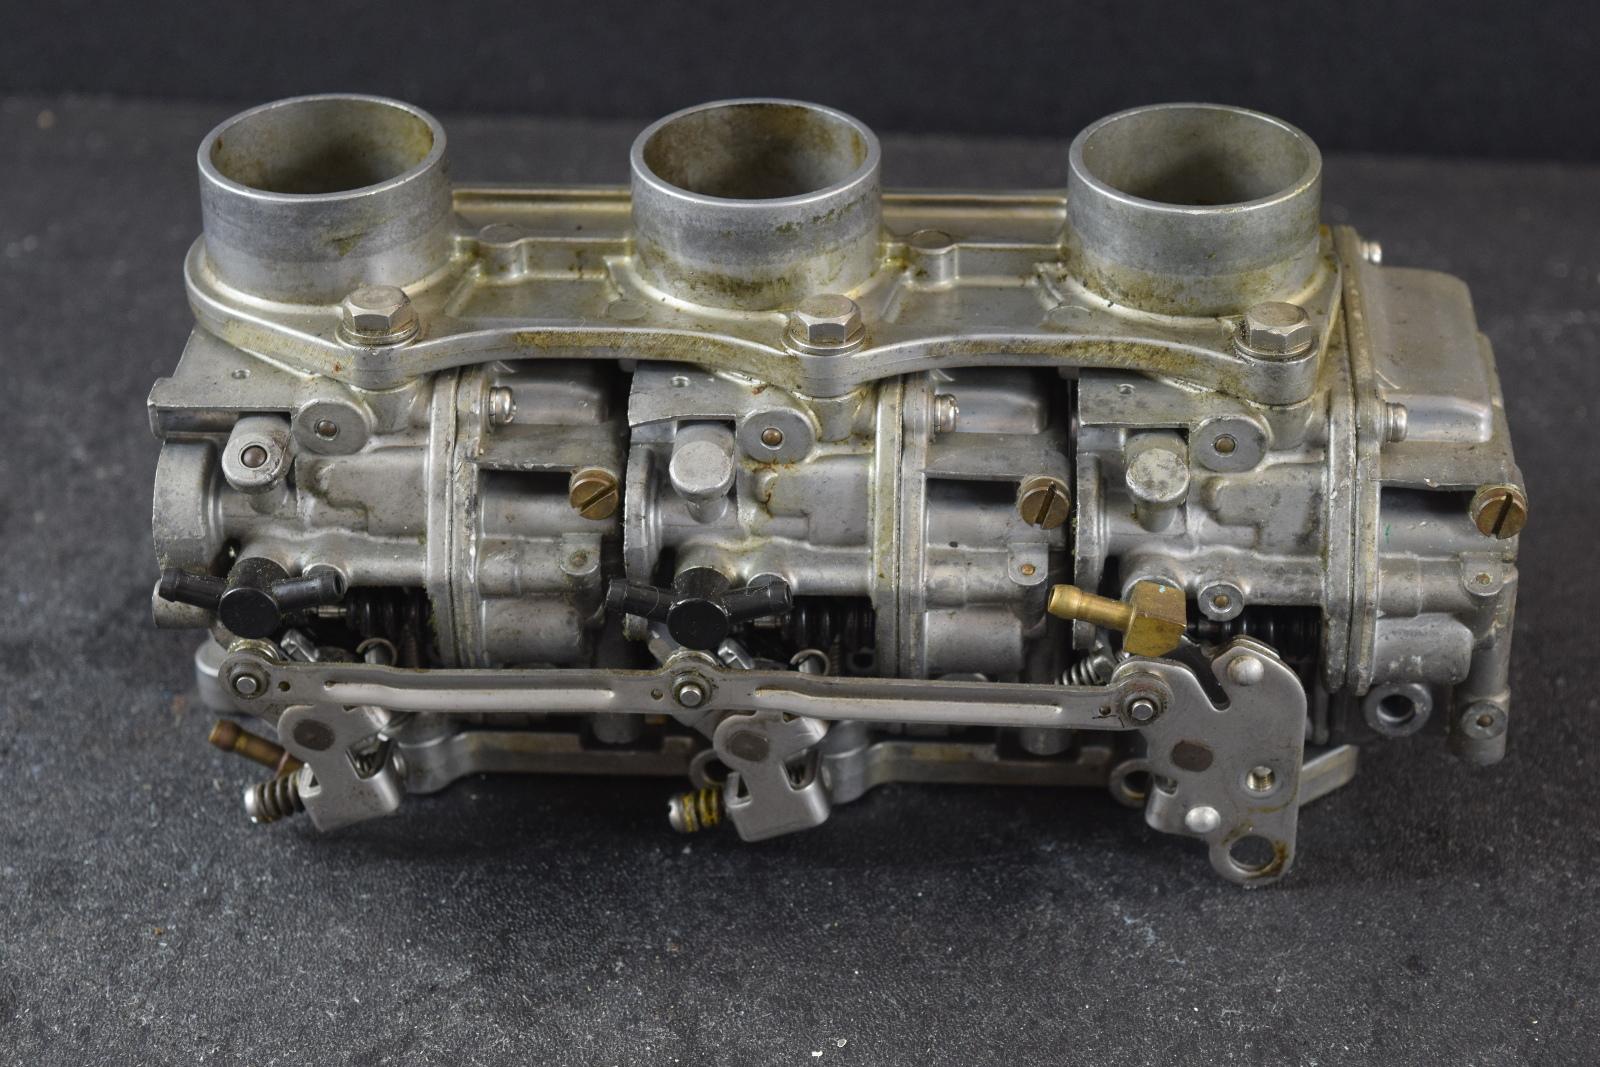 1984 25 hp Mercury timing